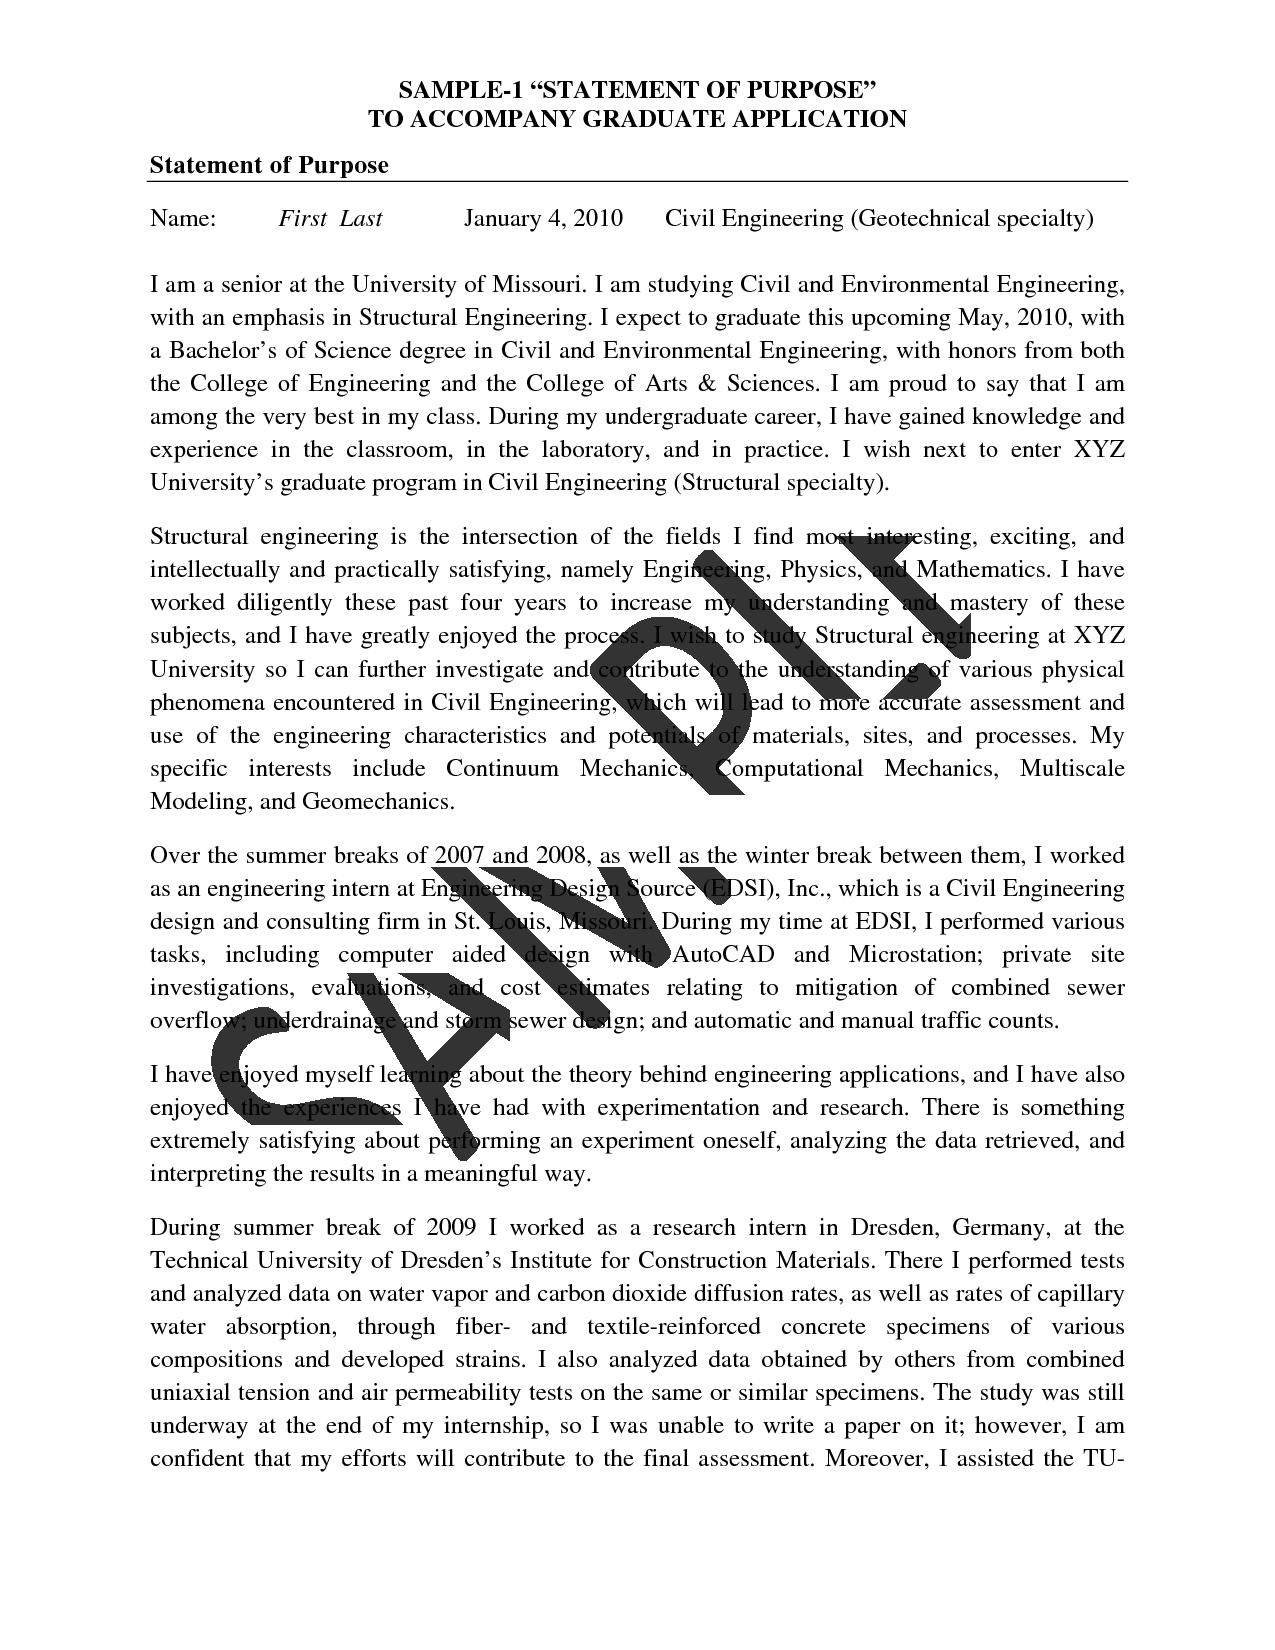 007 Essay Example Statement Of Purpose Graduate School Sample Essays Template Top Examples Mba Nursing Full